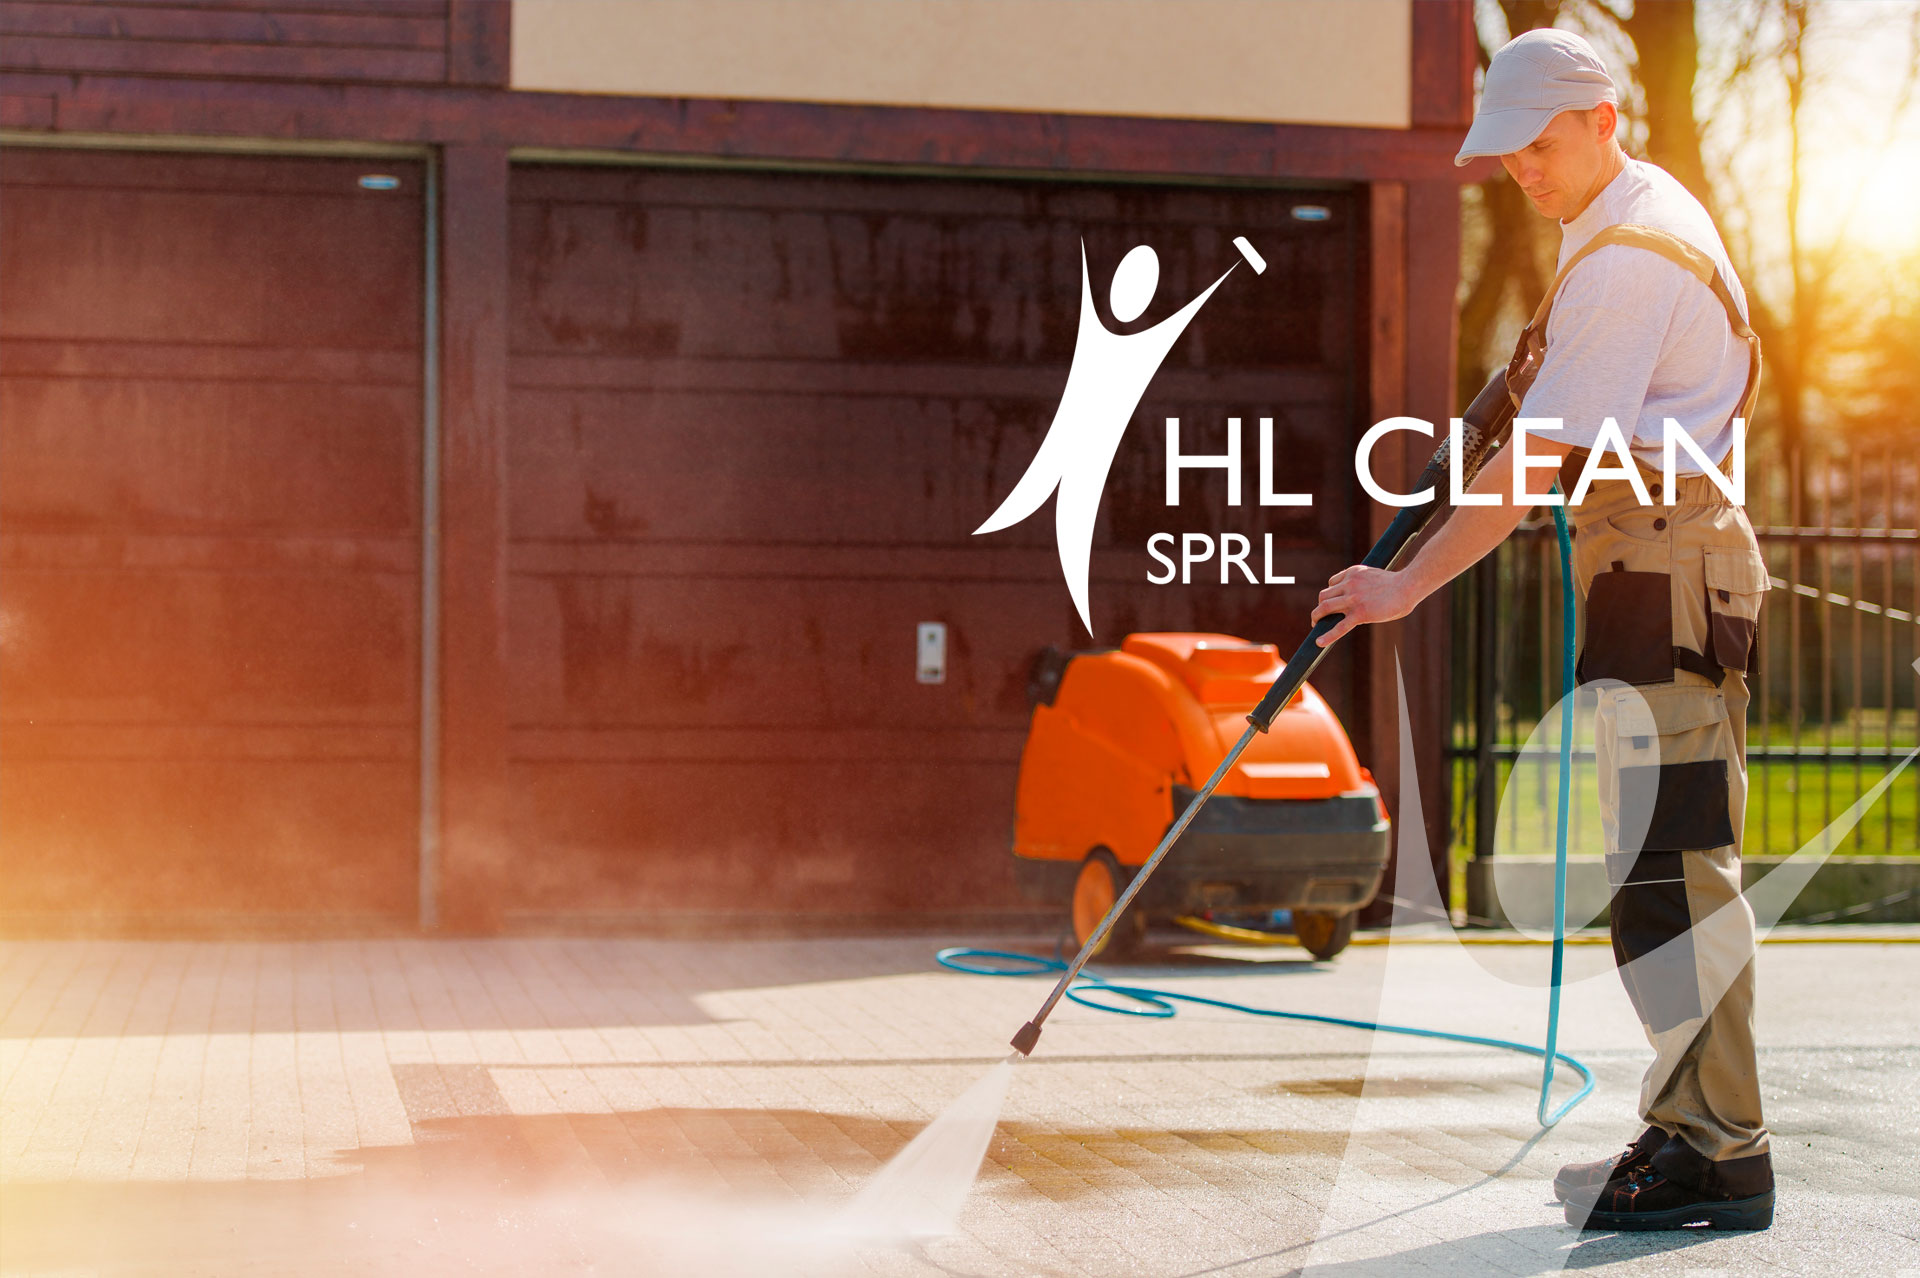 hl-clean-accueil-intervention